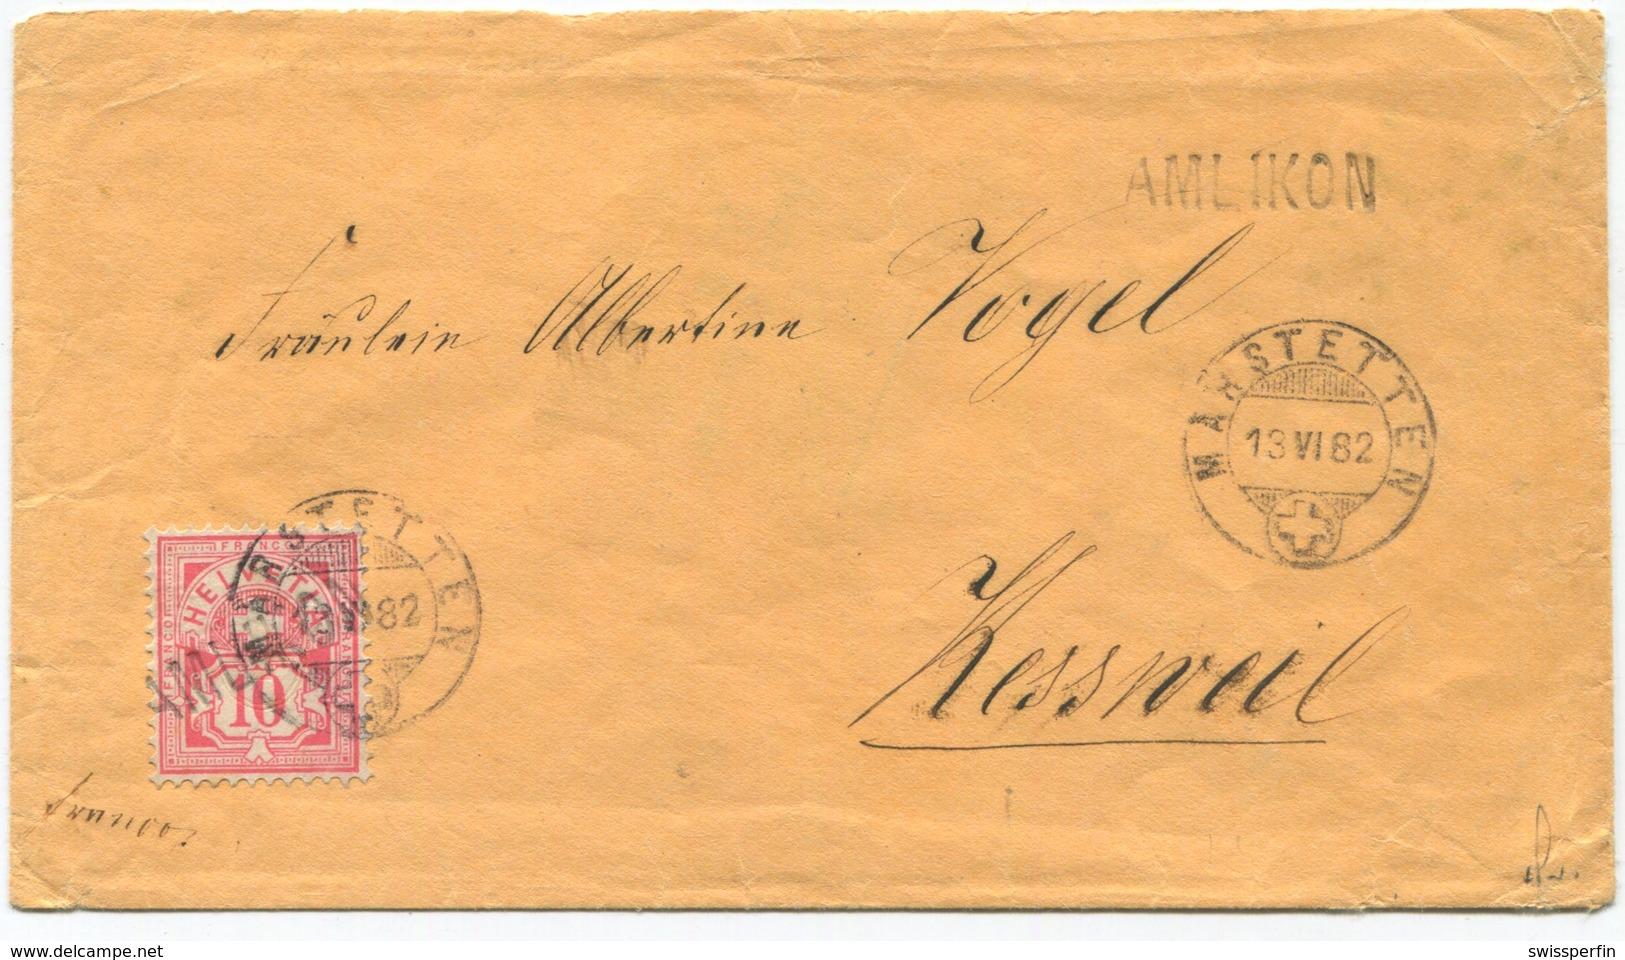 1803 - AMLIKON Stabstempel Auf 10 Rp. Wertziffer (weisses Papier) Mit Datumstempel MÄRSTETTEN 13 VI 82 - Lettres & Documents